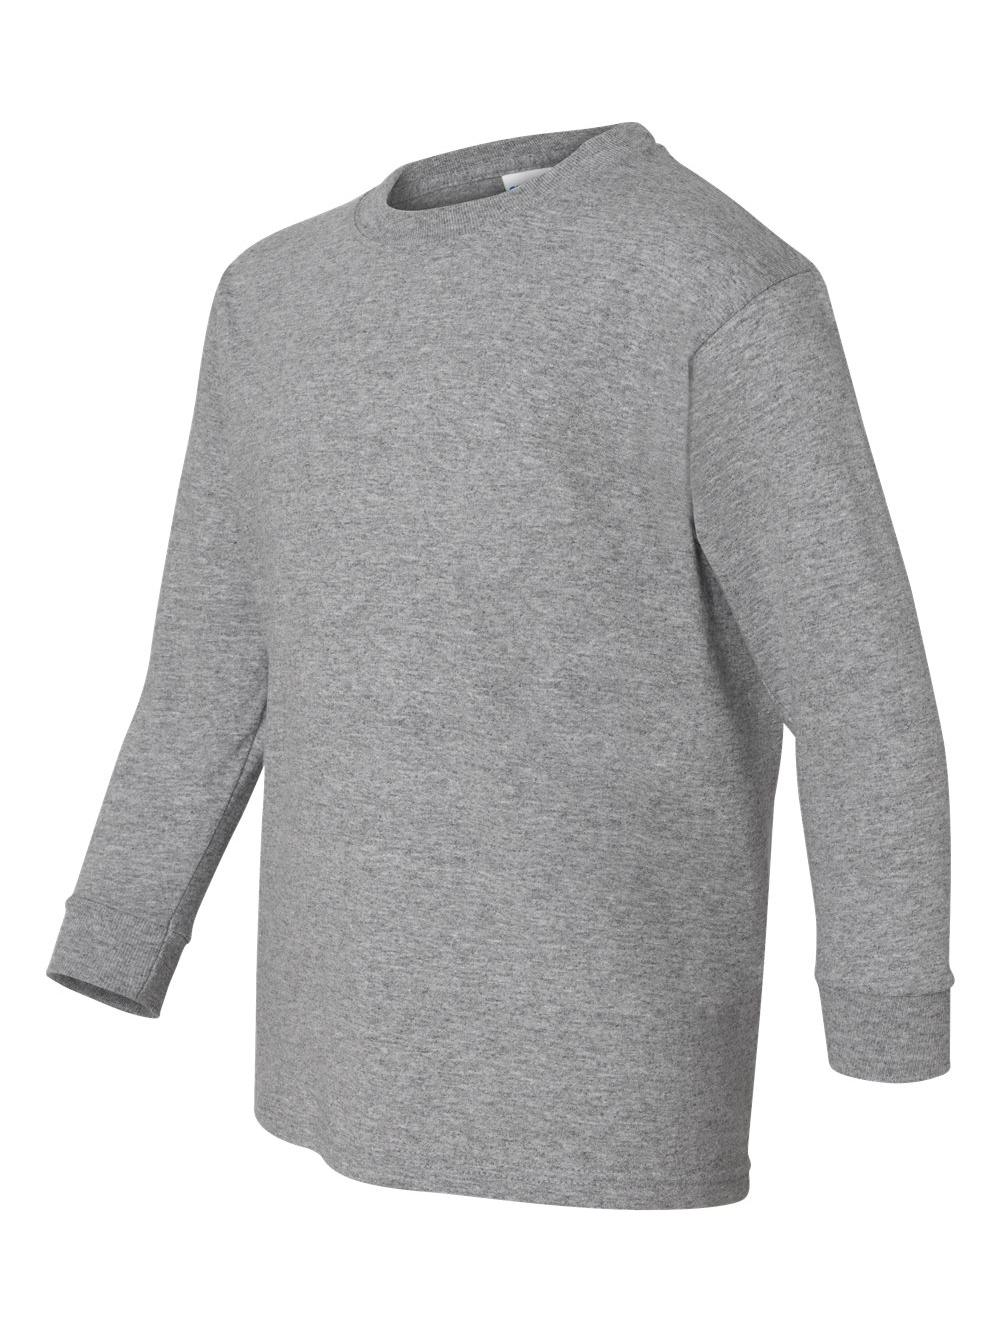 Gildan Heavy Cotton Youth Long Sleeve T-Shirt 5400B